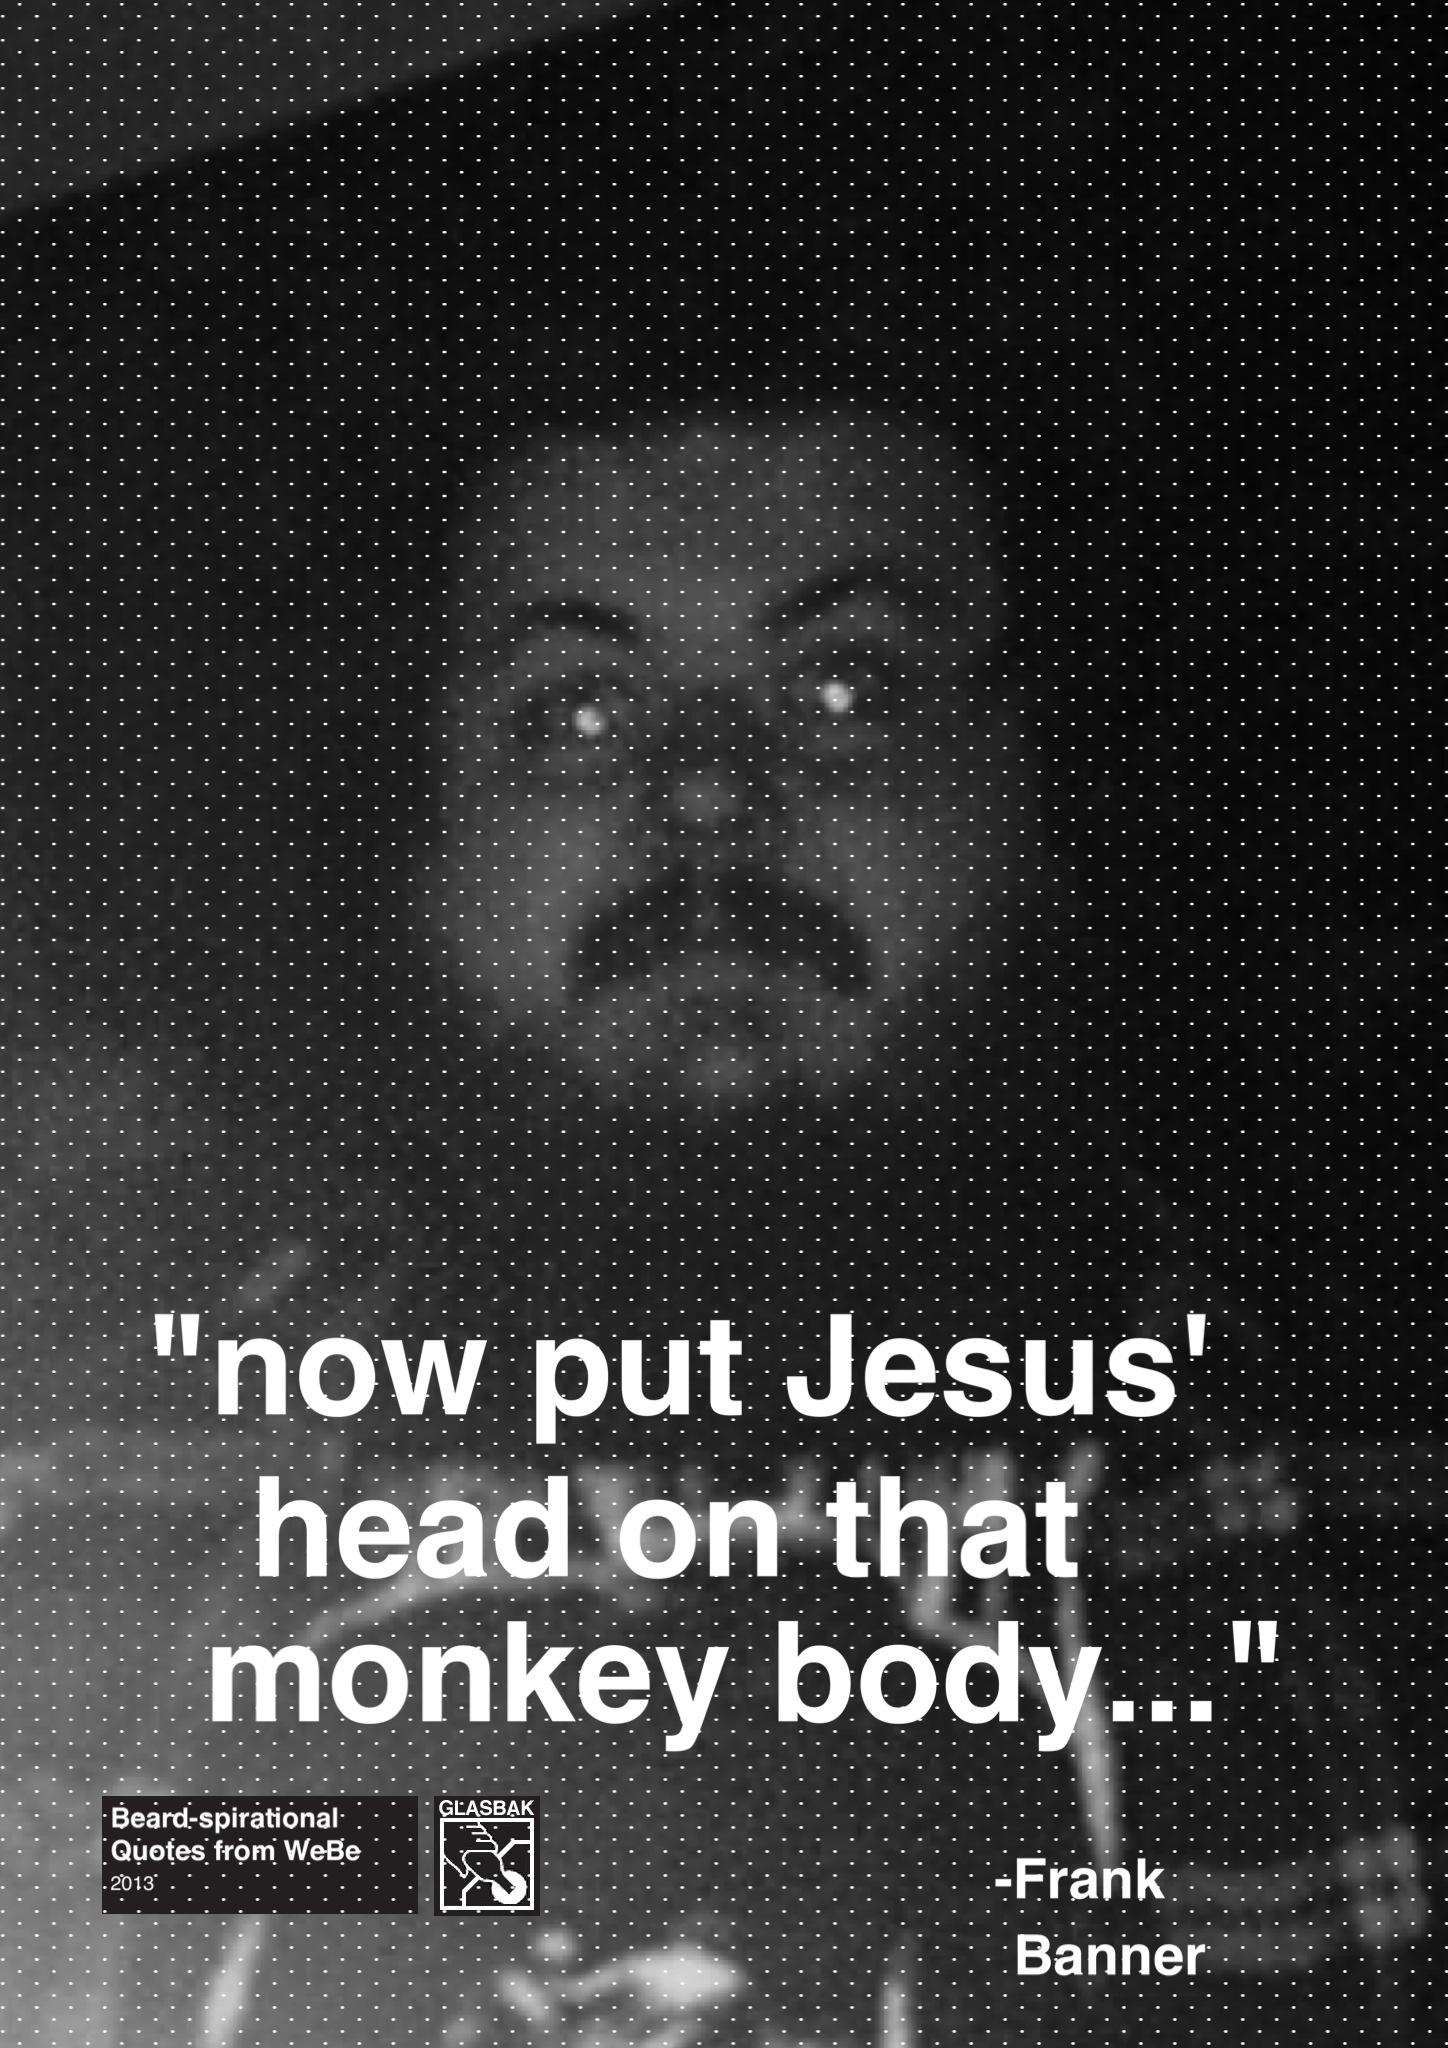 2013-07-15_now put Jesus' head on that monkey body....jpg